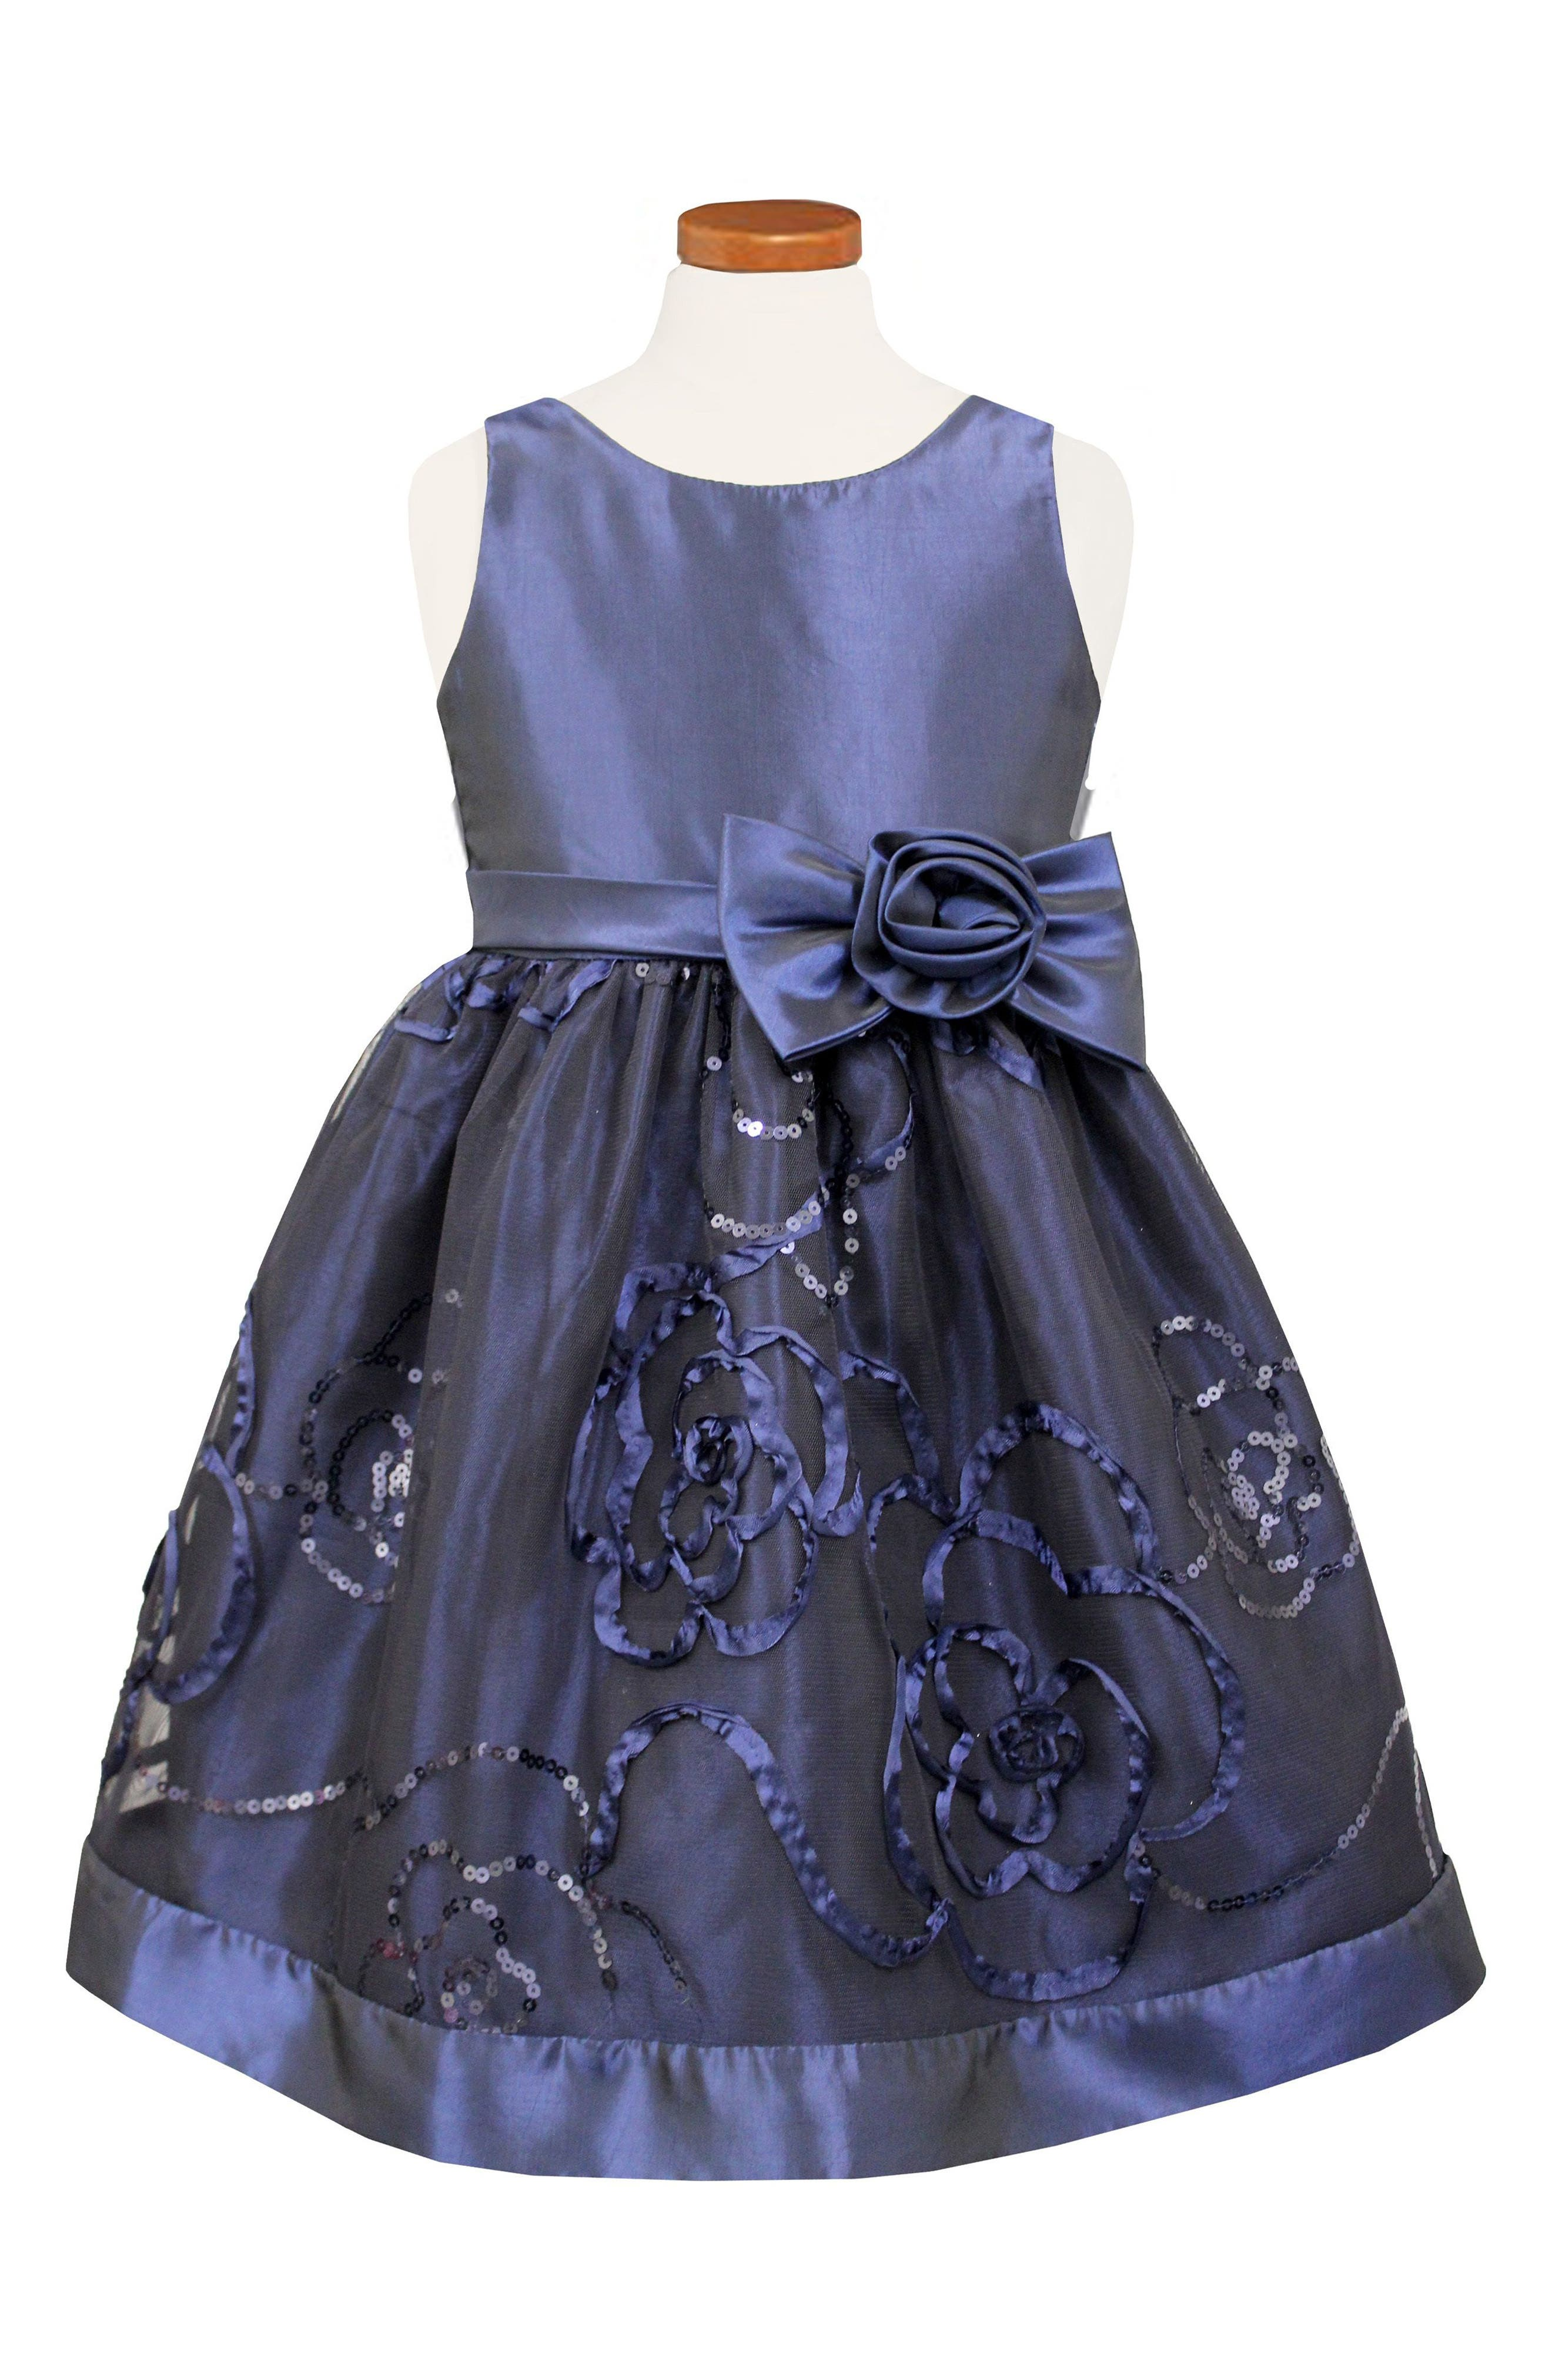 Sorbet Sequin Party Dress (Toddler Girls & Little Girls)